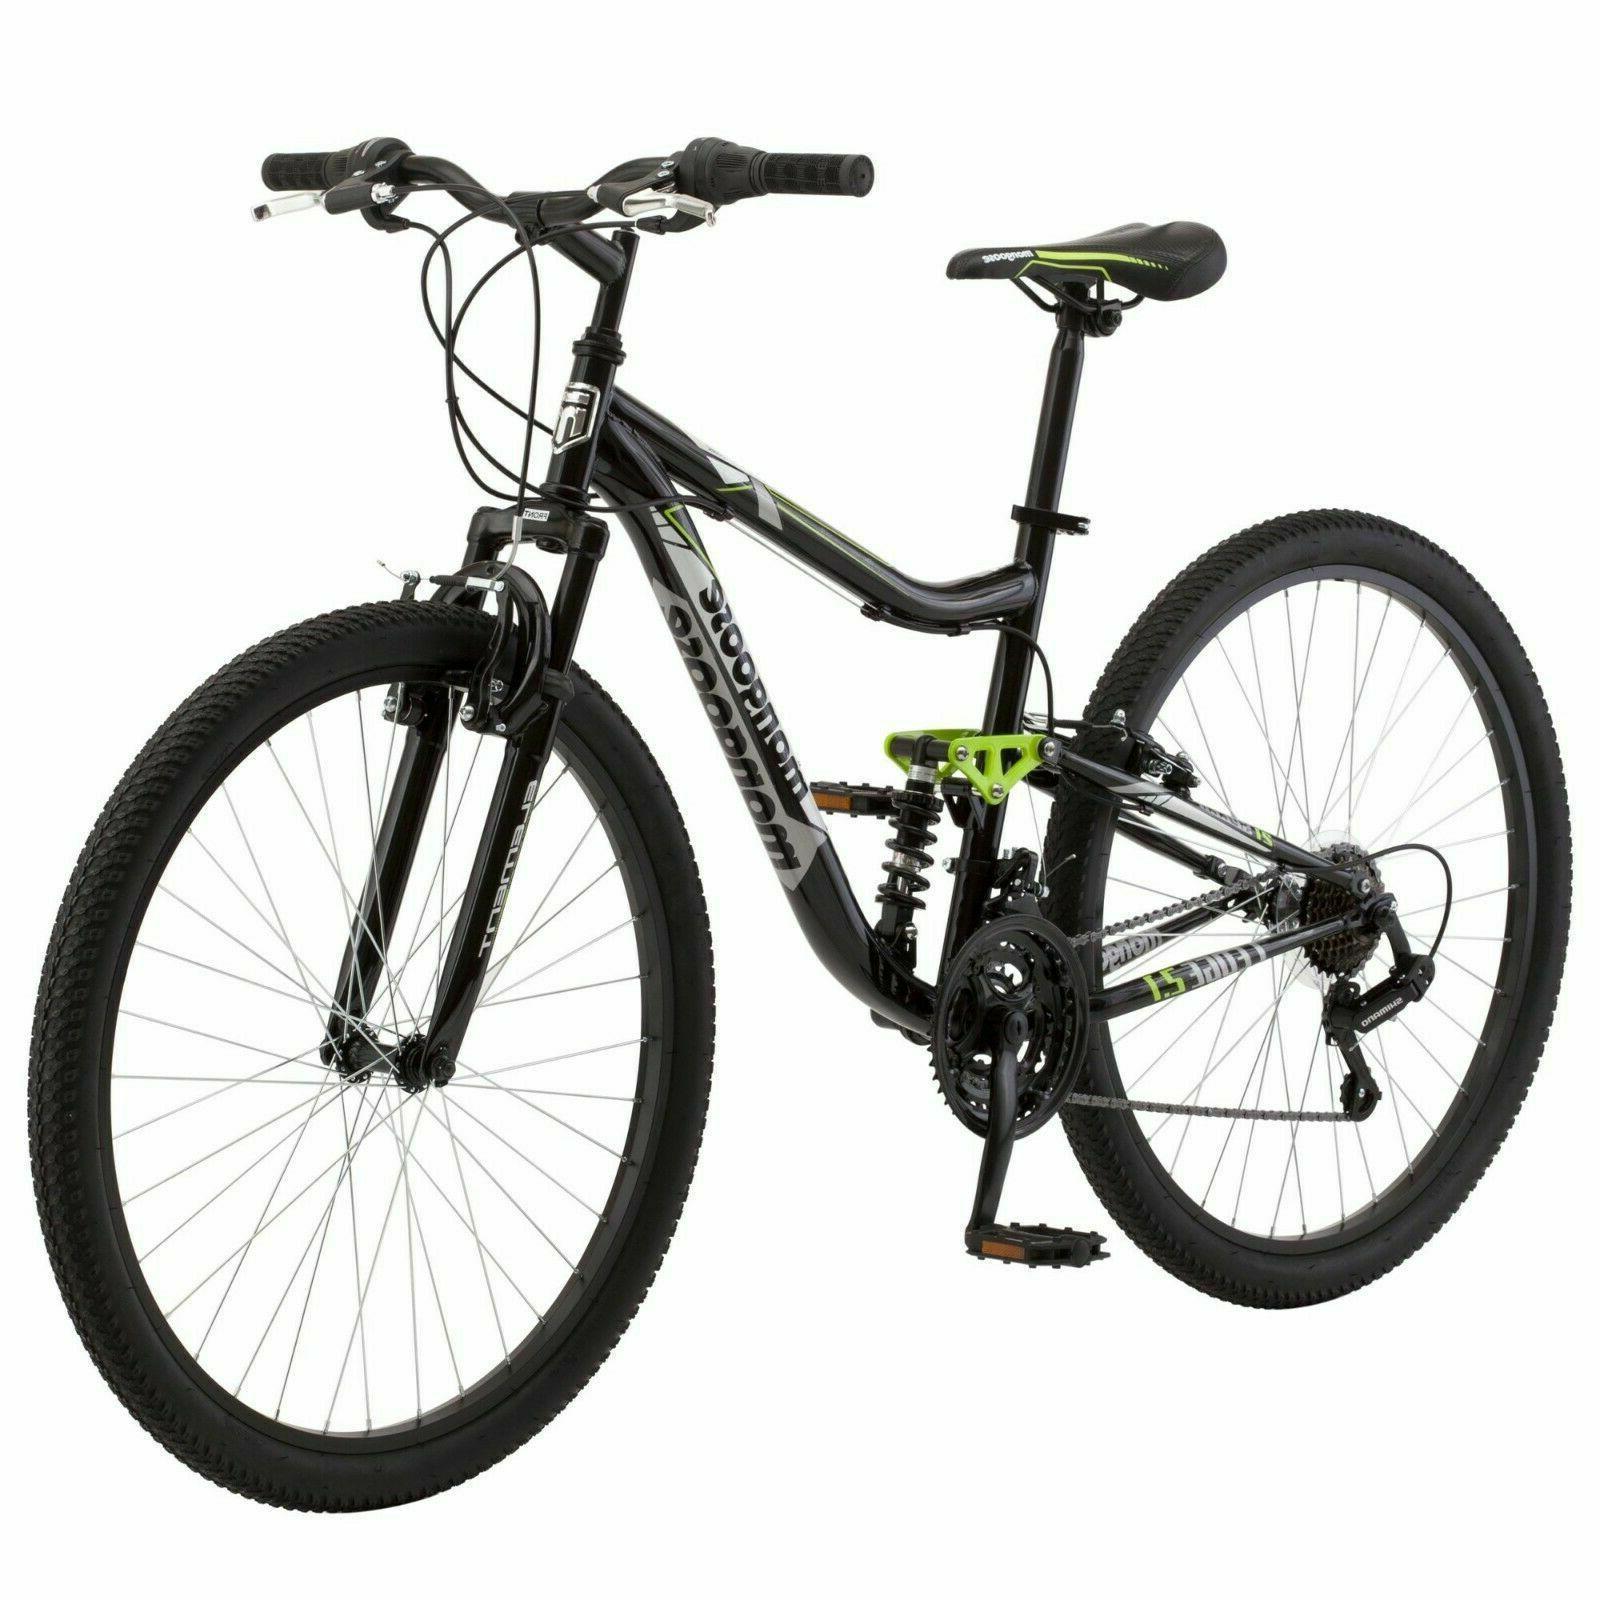 "🚦Mongoose Ledge 2.1 Mountain Bike, 27.5"" wheels, 21 speed"